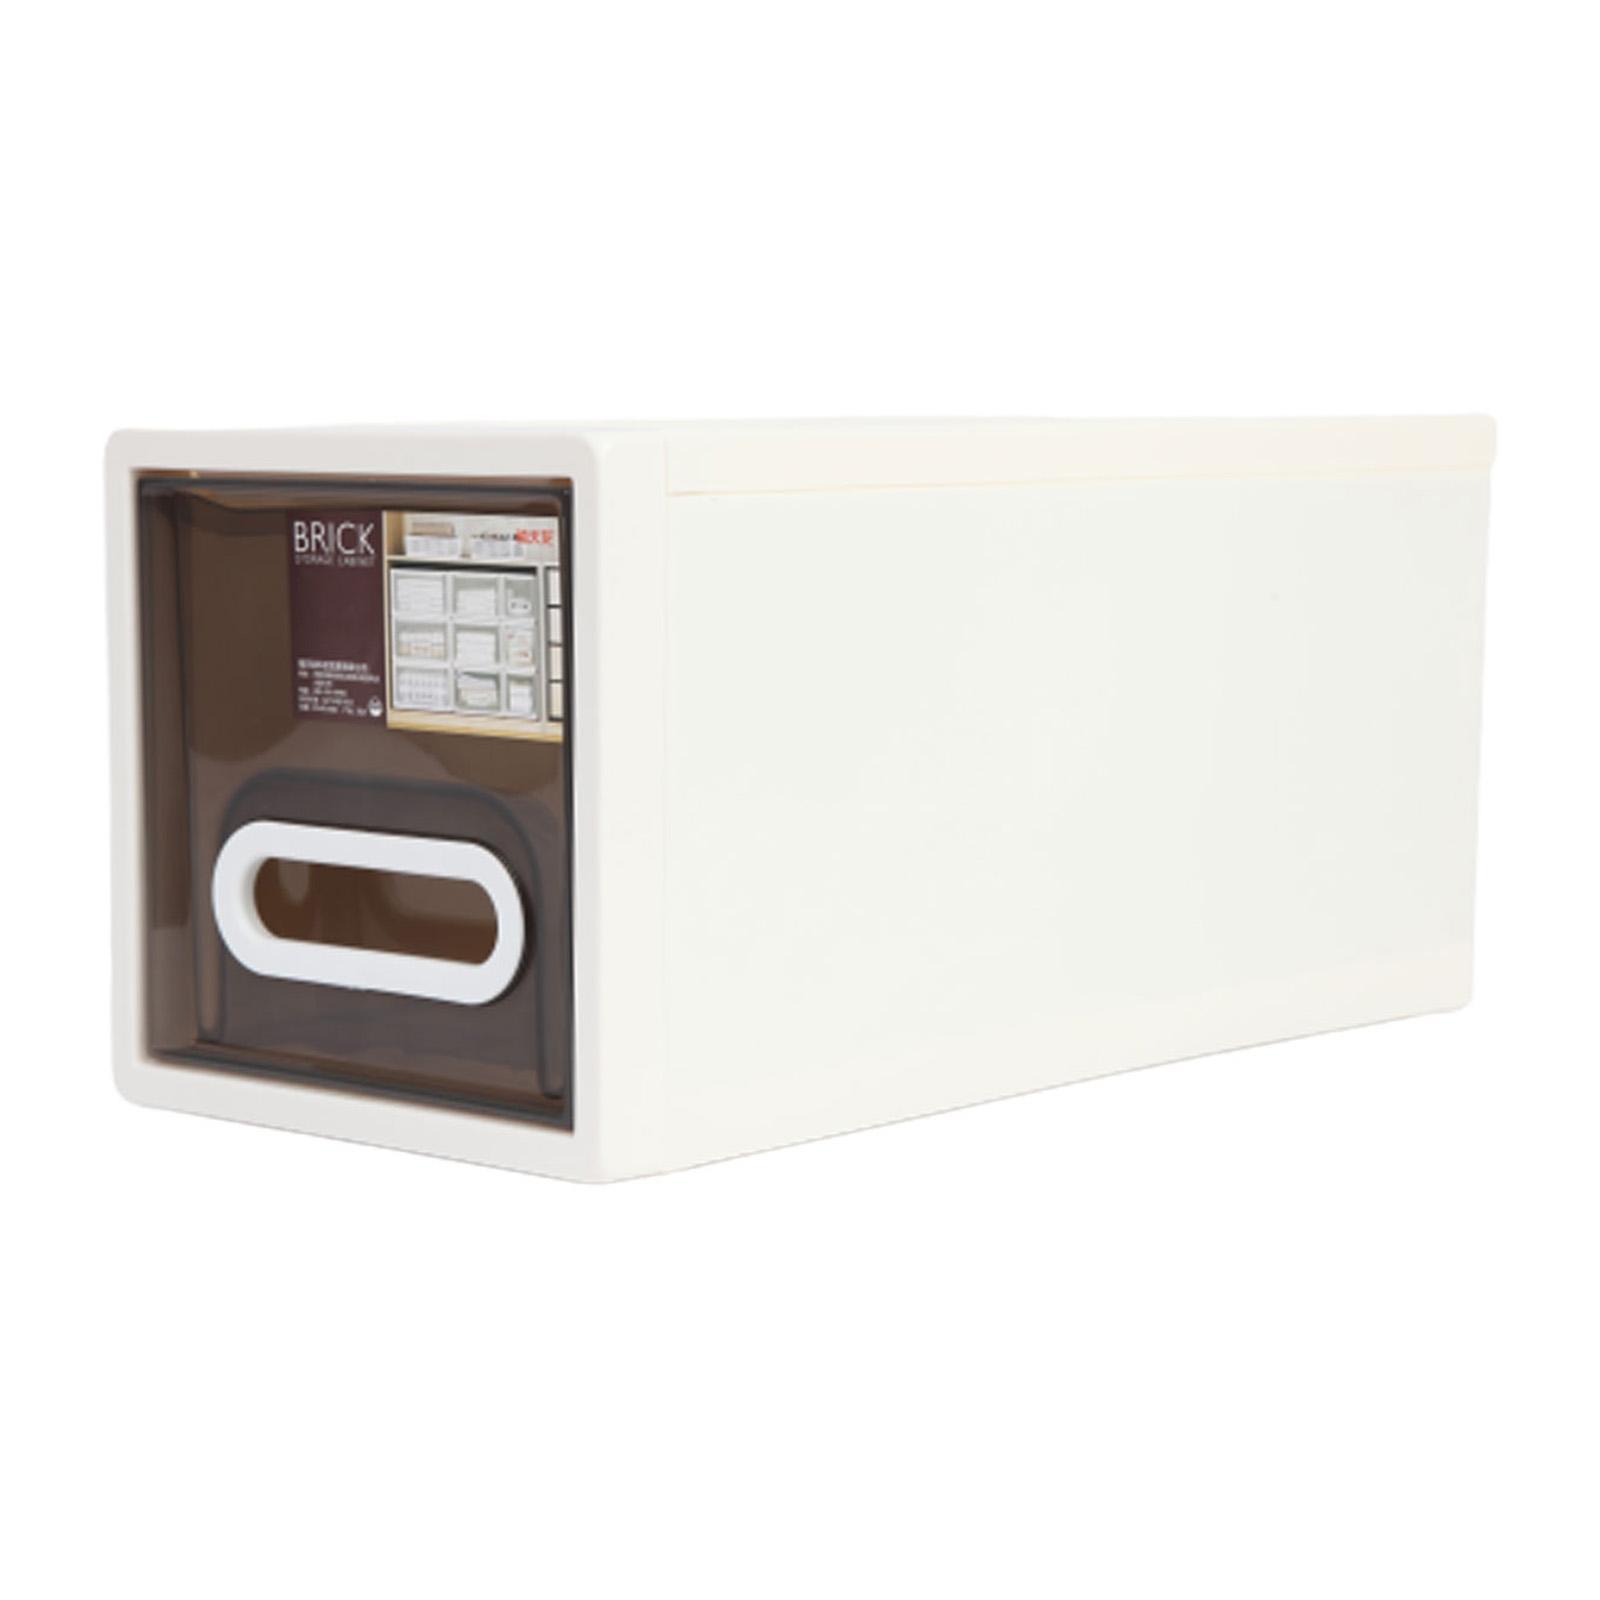 Citylife Brick Modular Drawer - 9L - 45x20x20.5cm